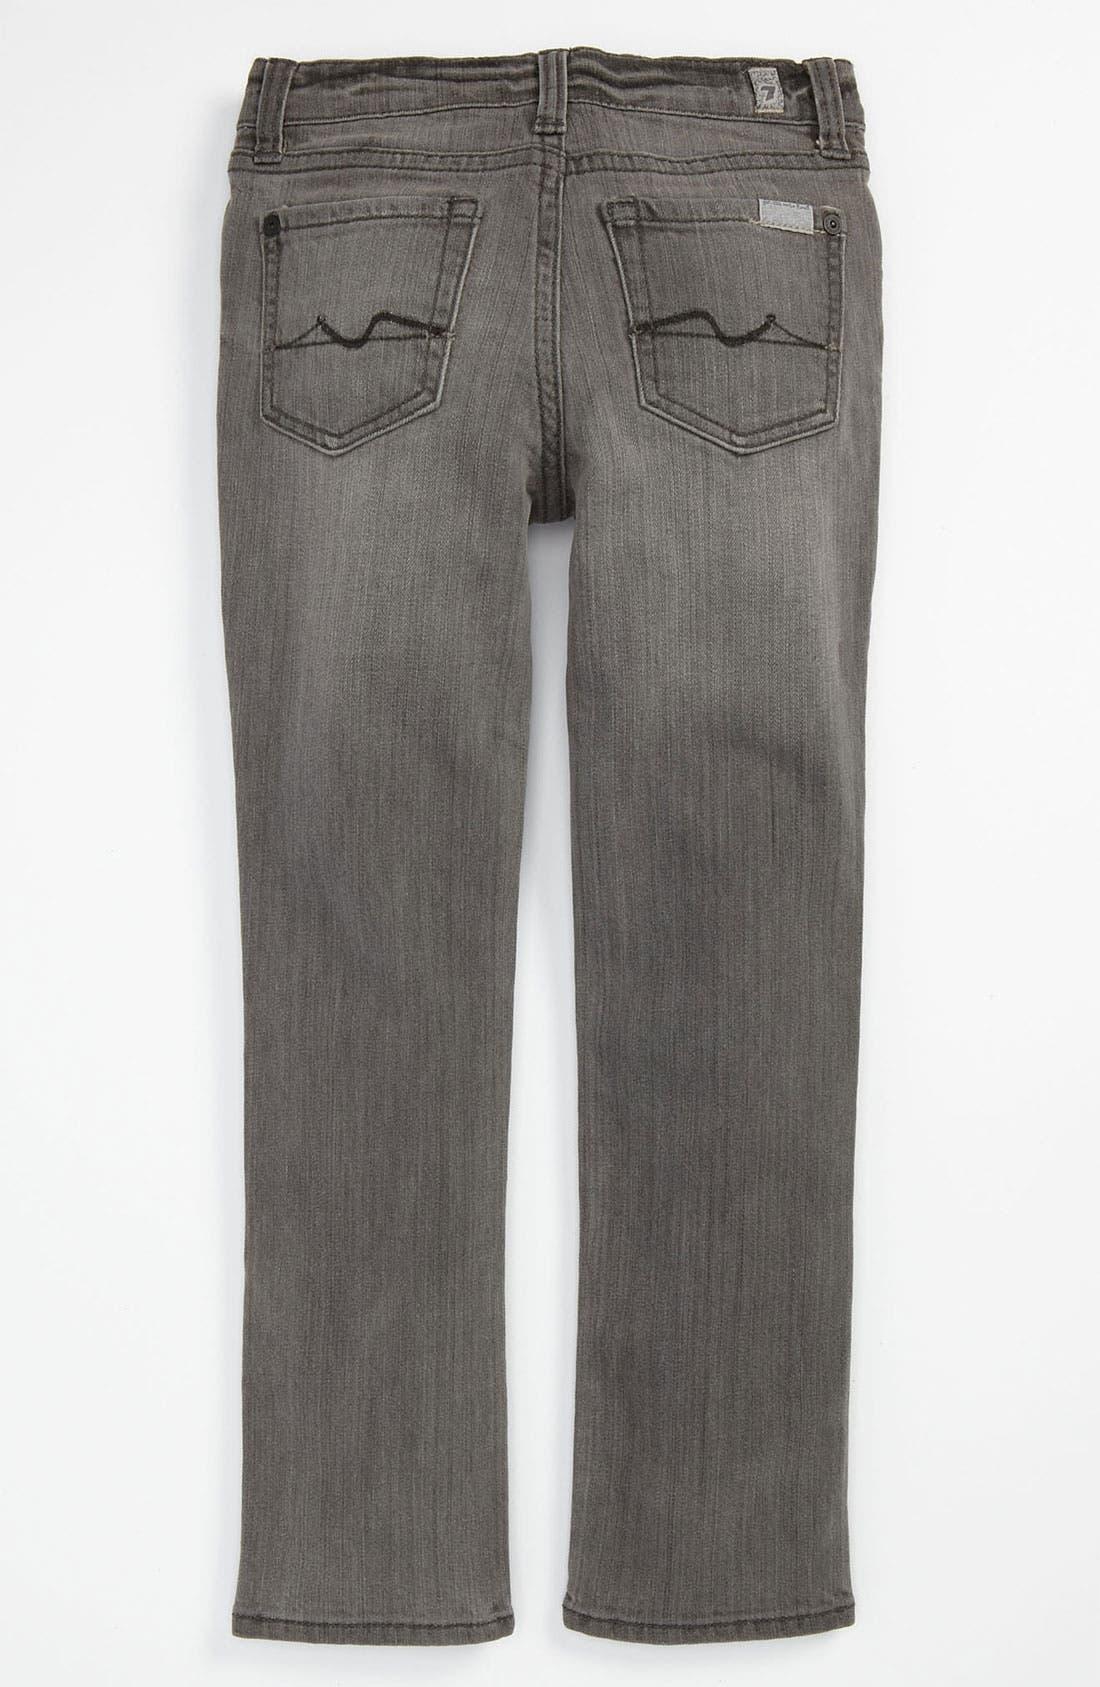 Alternate Image 1 Selected - 7 For All Mankind® 'Roxanne' Skinny Jeans (Little Girls)